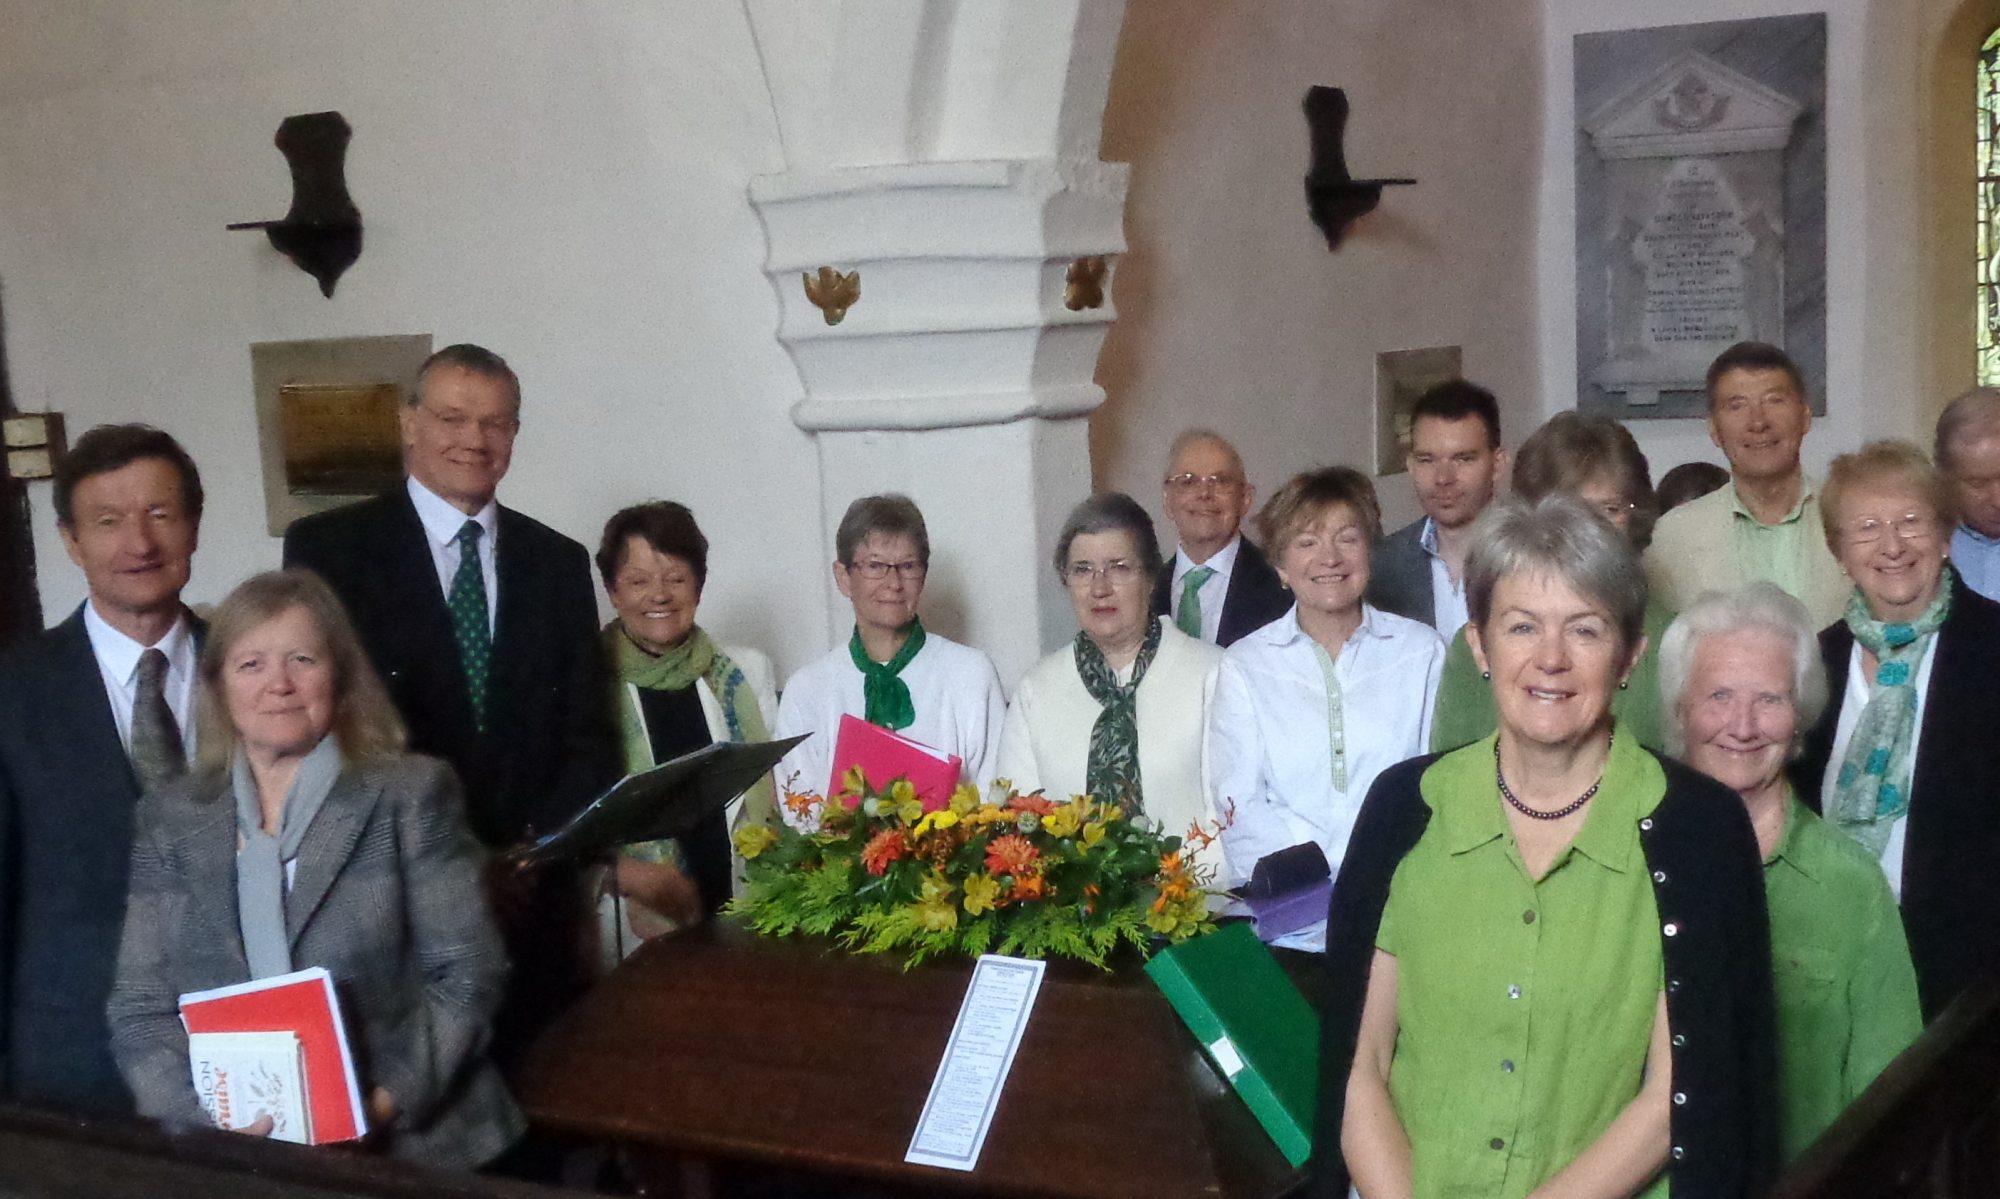 The Washburn Valley Choir